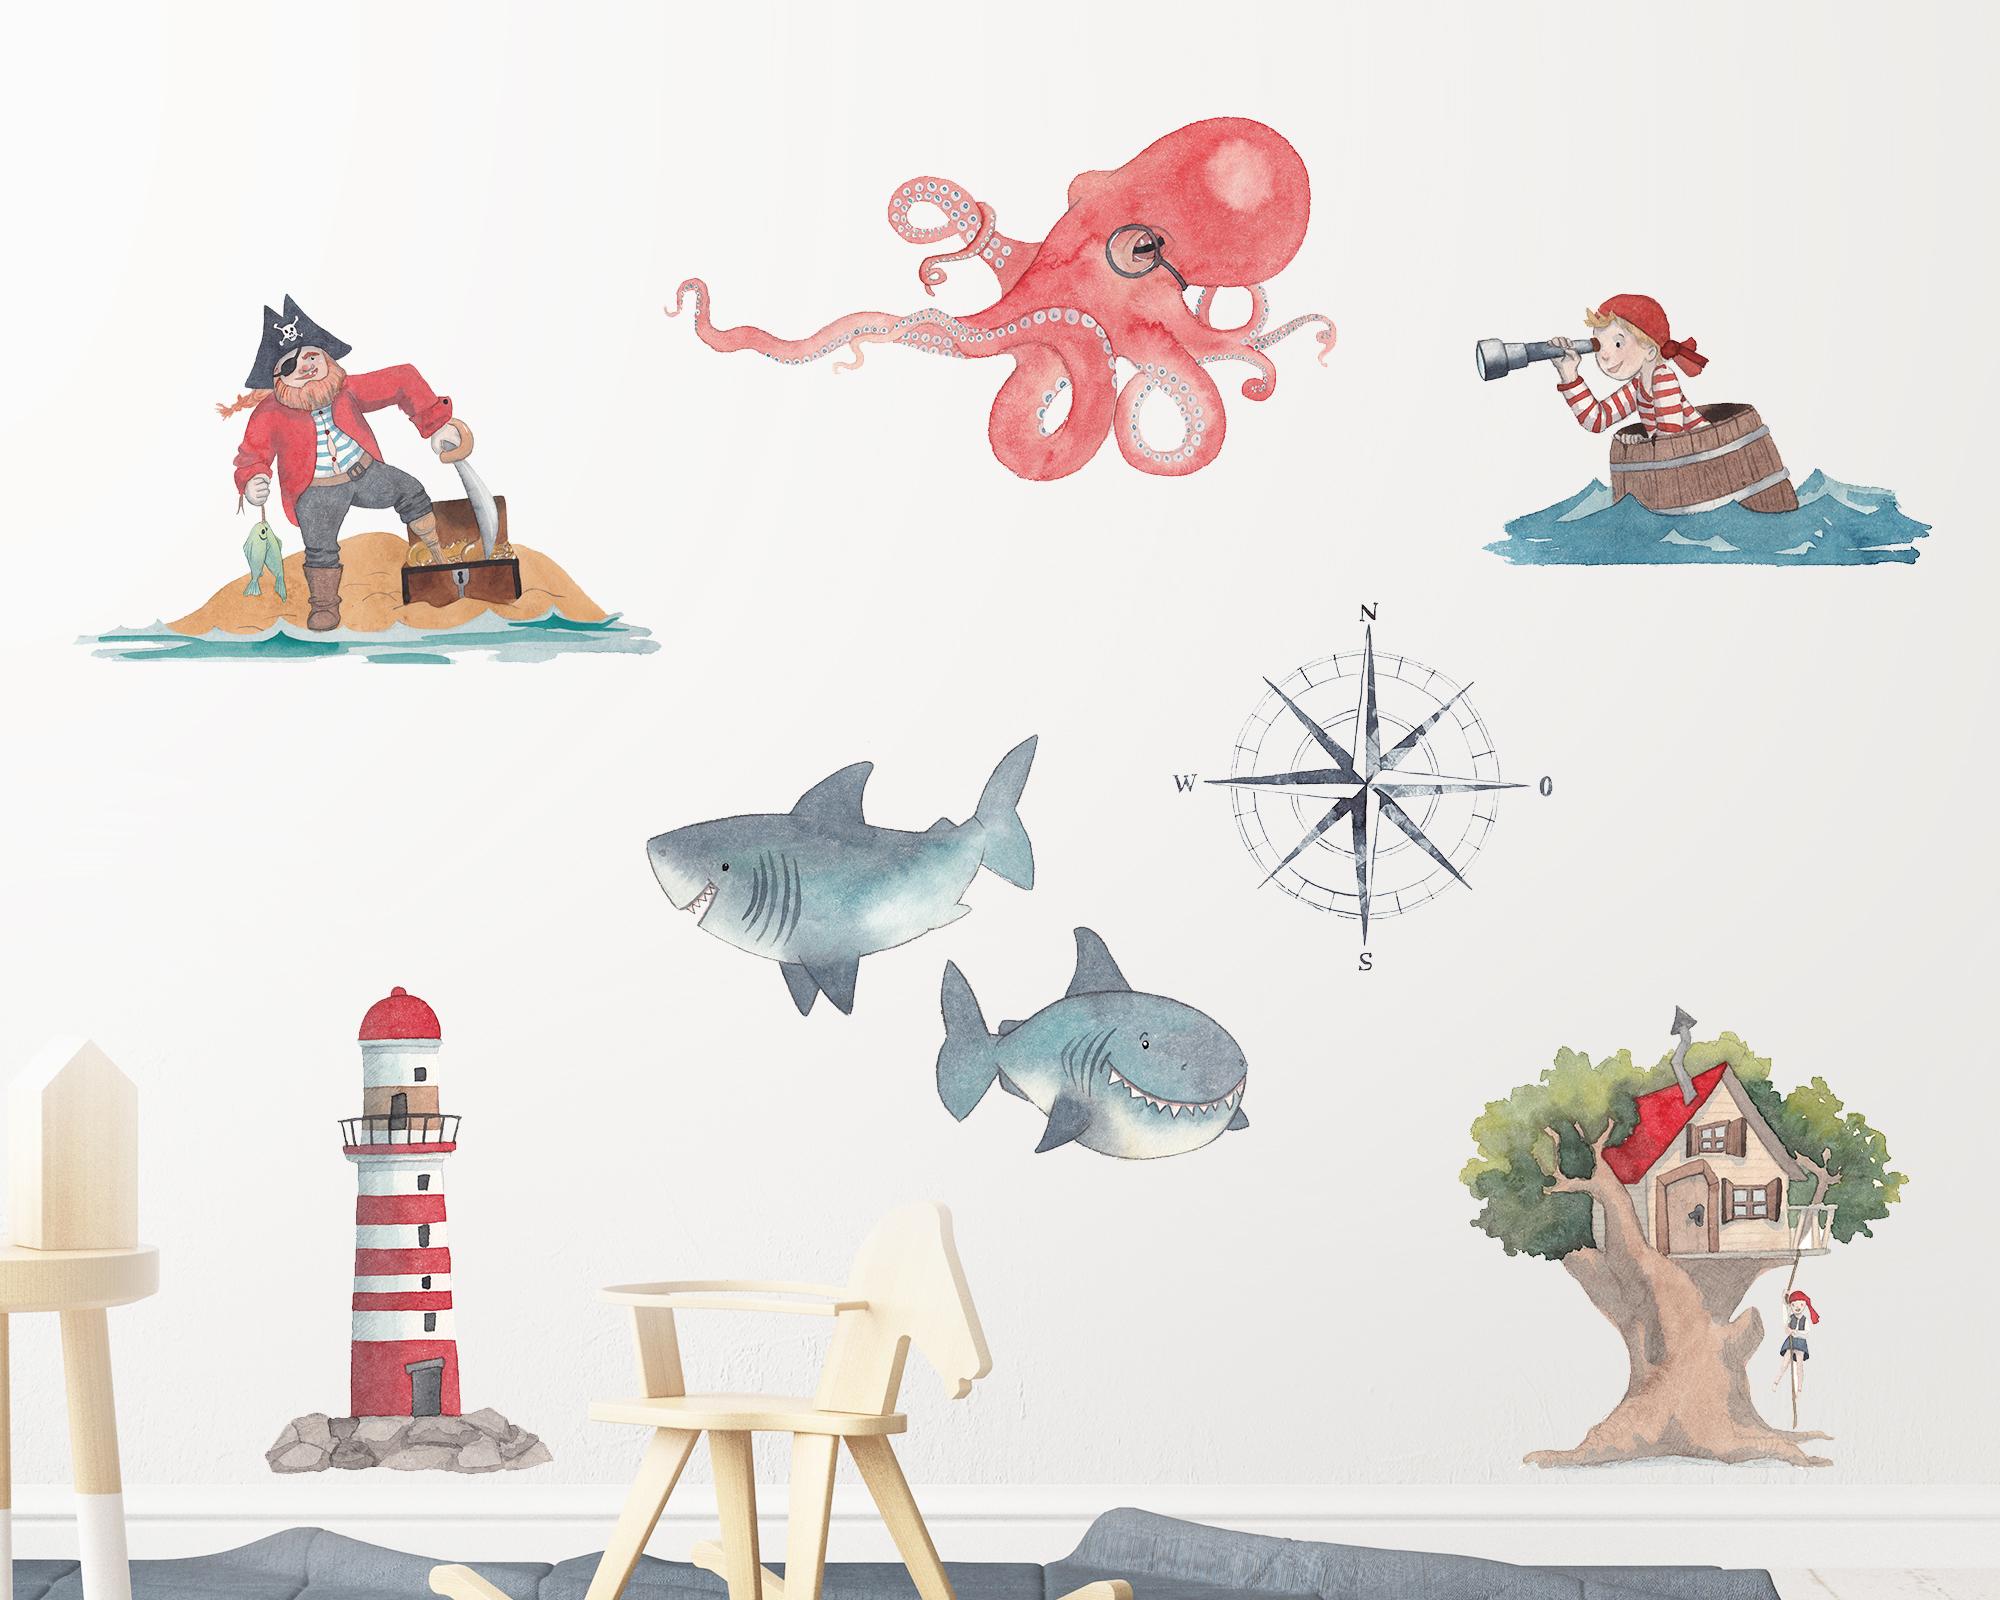 Full Size of Piraten Kinderzimmer Regale Regal Weiß Sofa Kinderzimmer Piraten Kinderzimmer